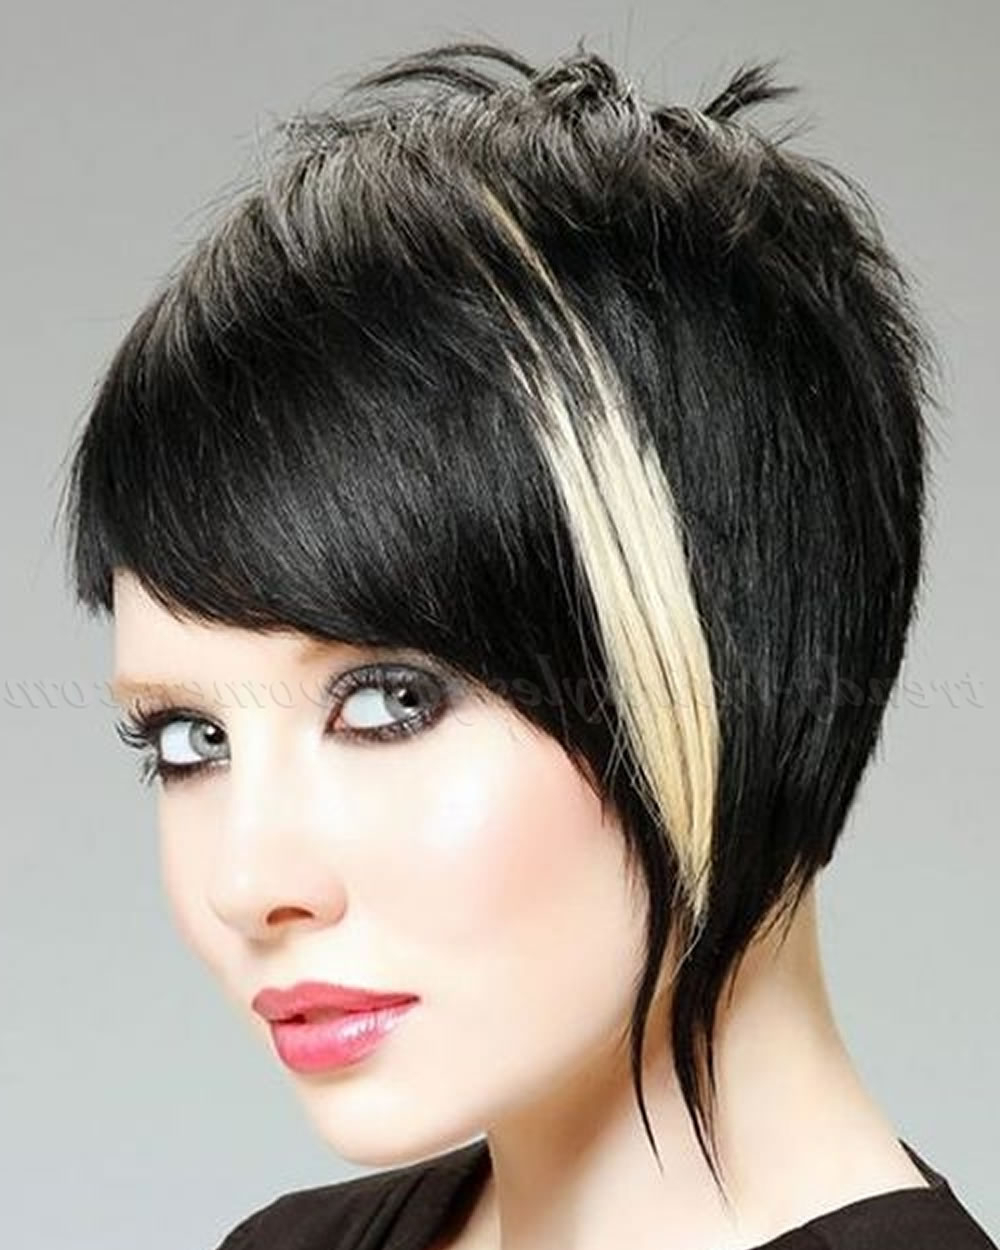 Asymmetrical Short Hair 2018 – 33 Haute Short Hairstyles & Haircuts Pertaining To Symmetrical Short Haircuts (View 7 of 25)